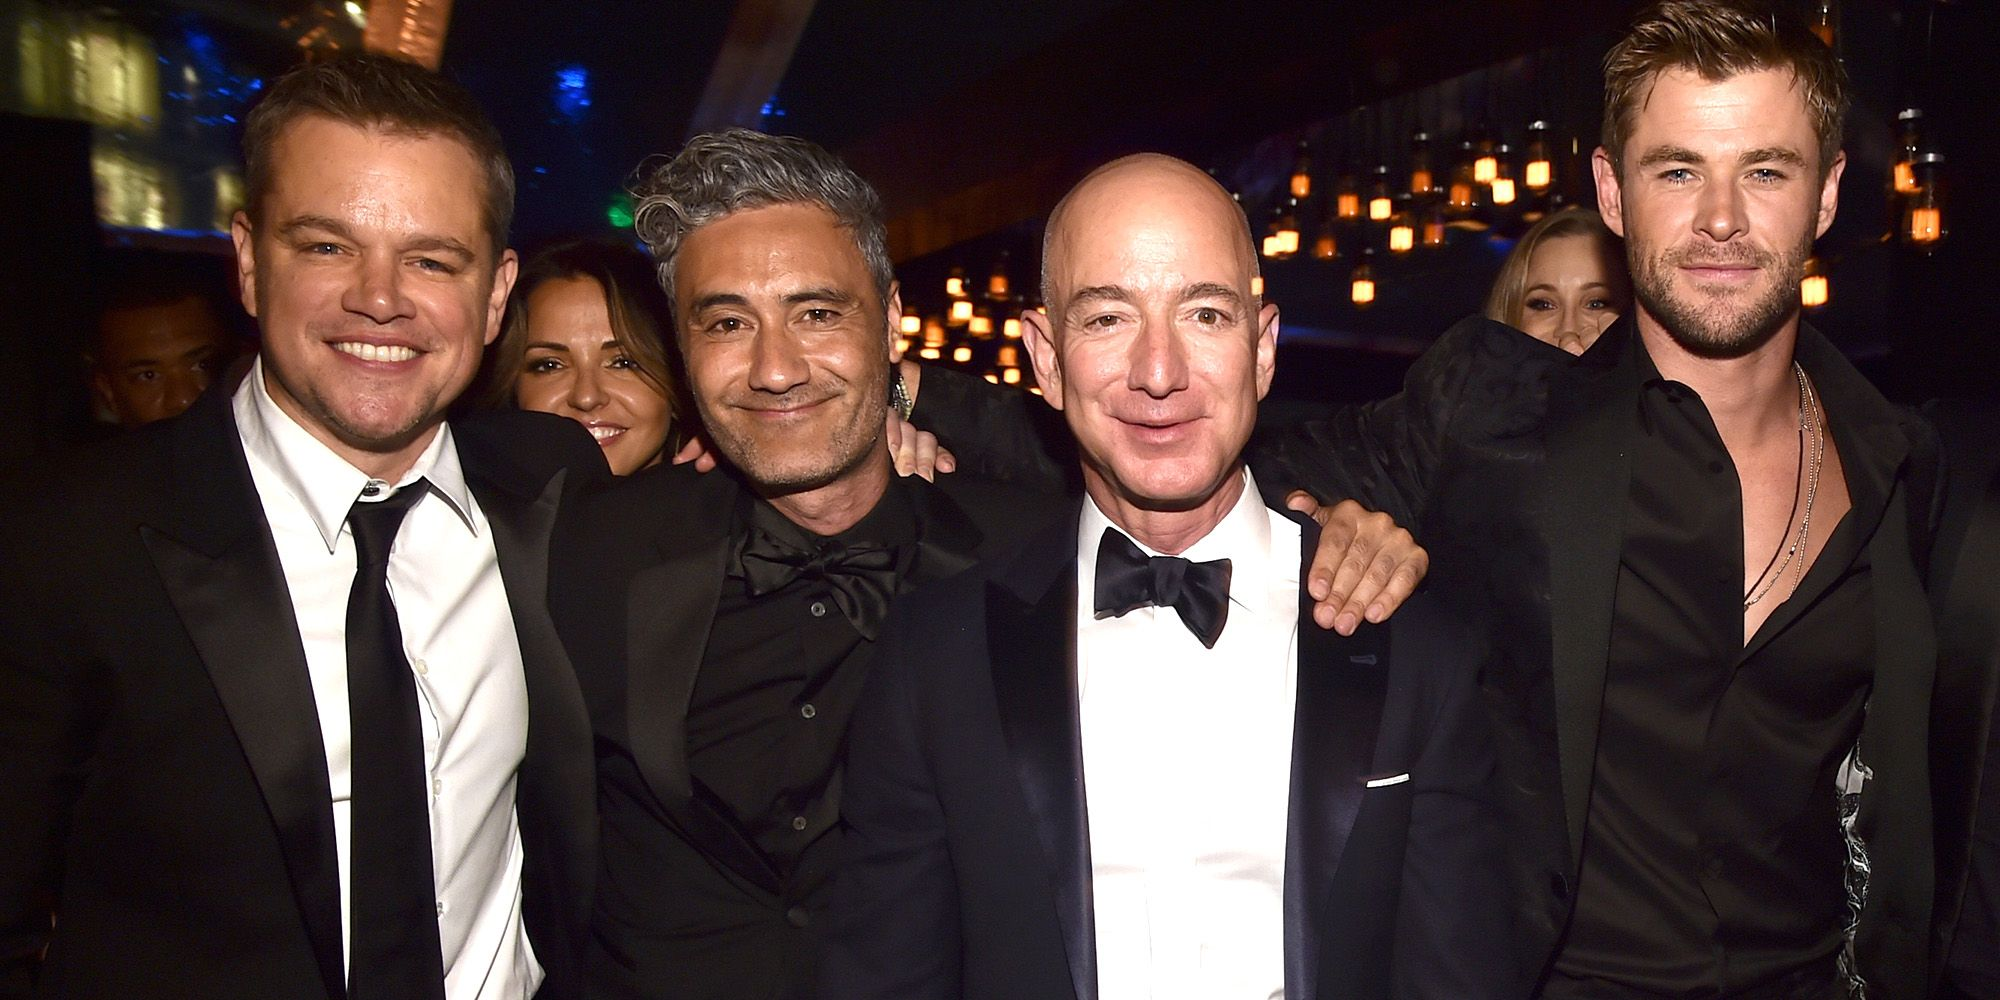 Jeff Bezos Net Worth - Amazon's Founder Jeff Bezos Is the